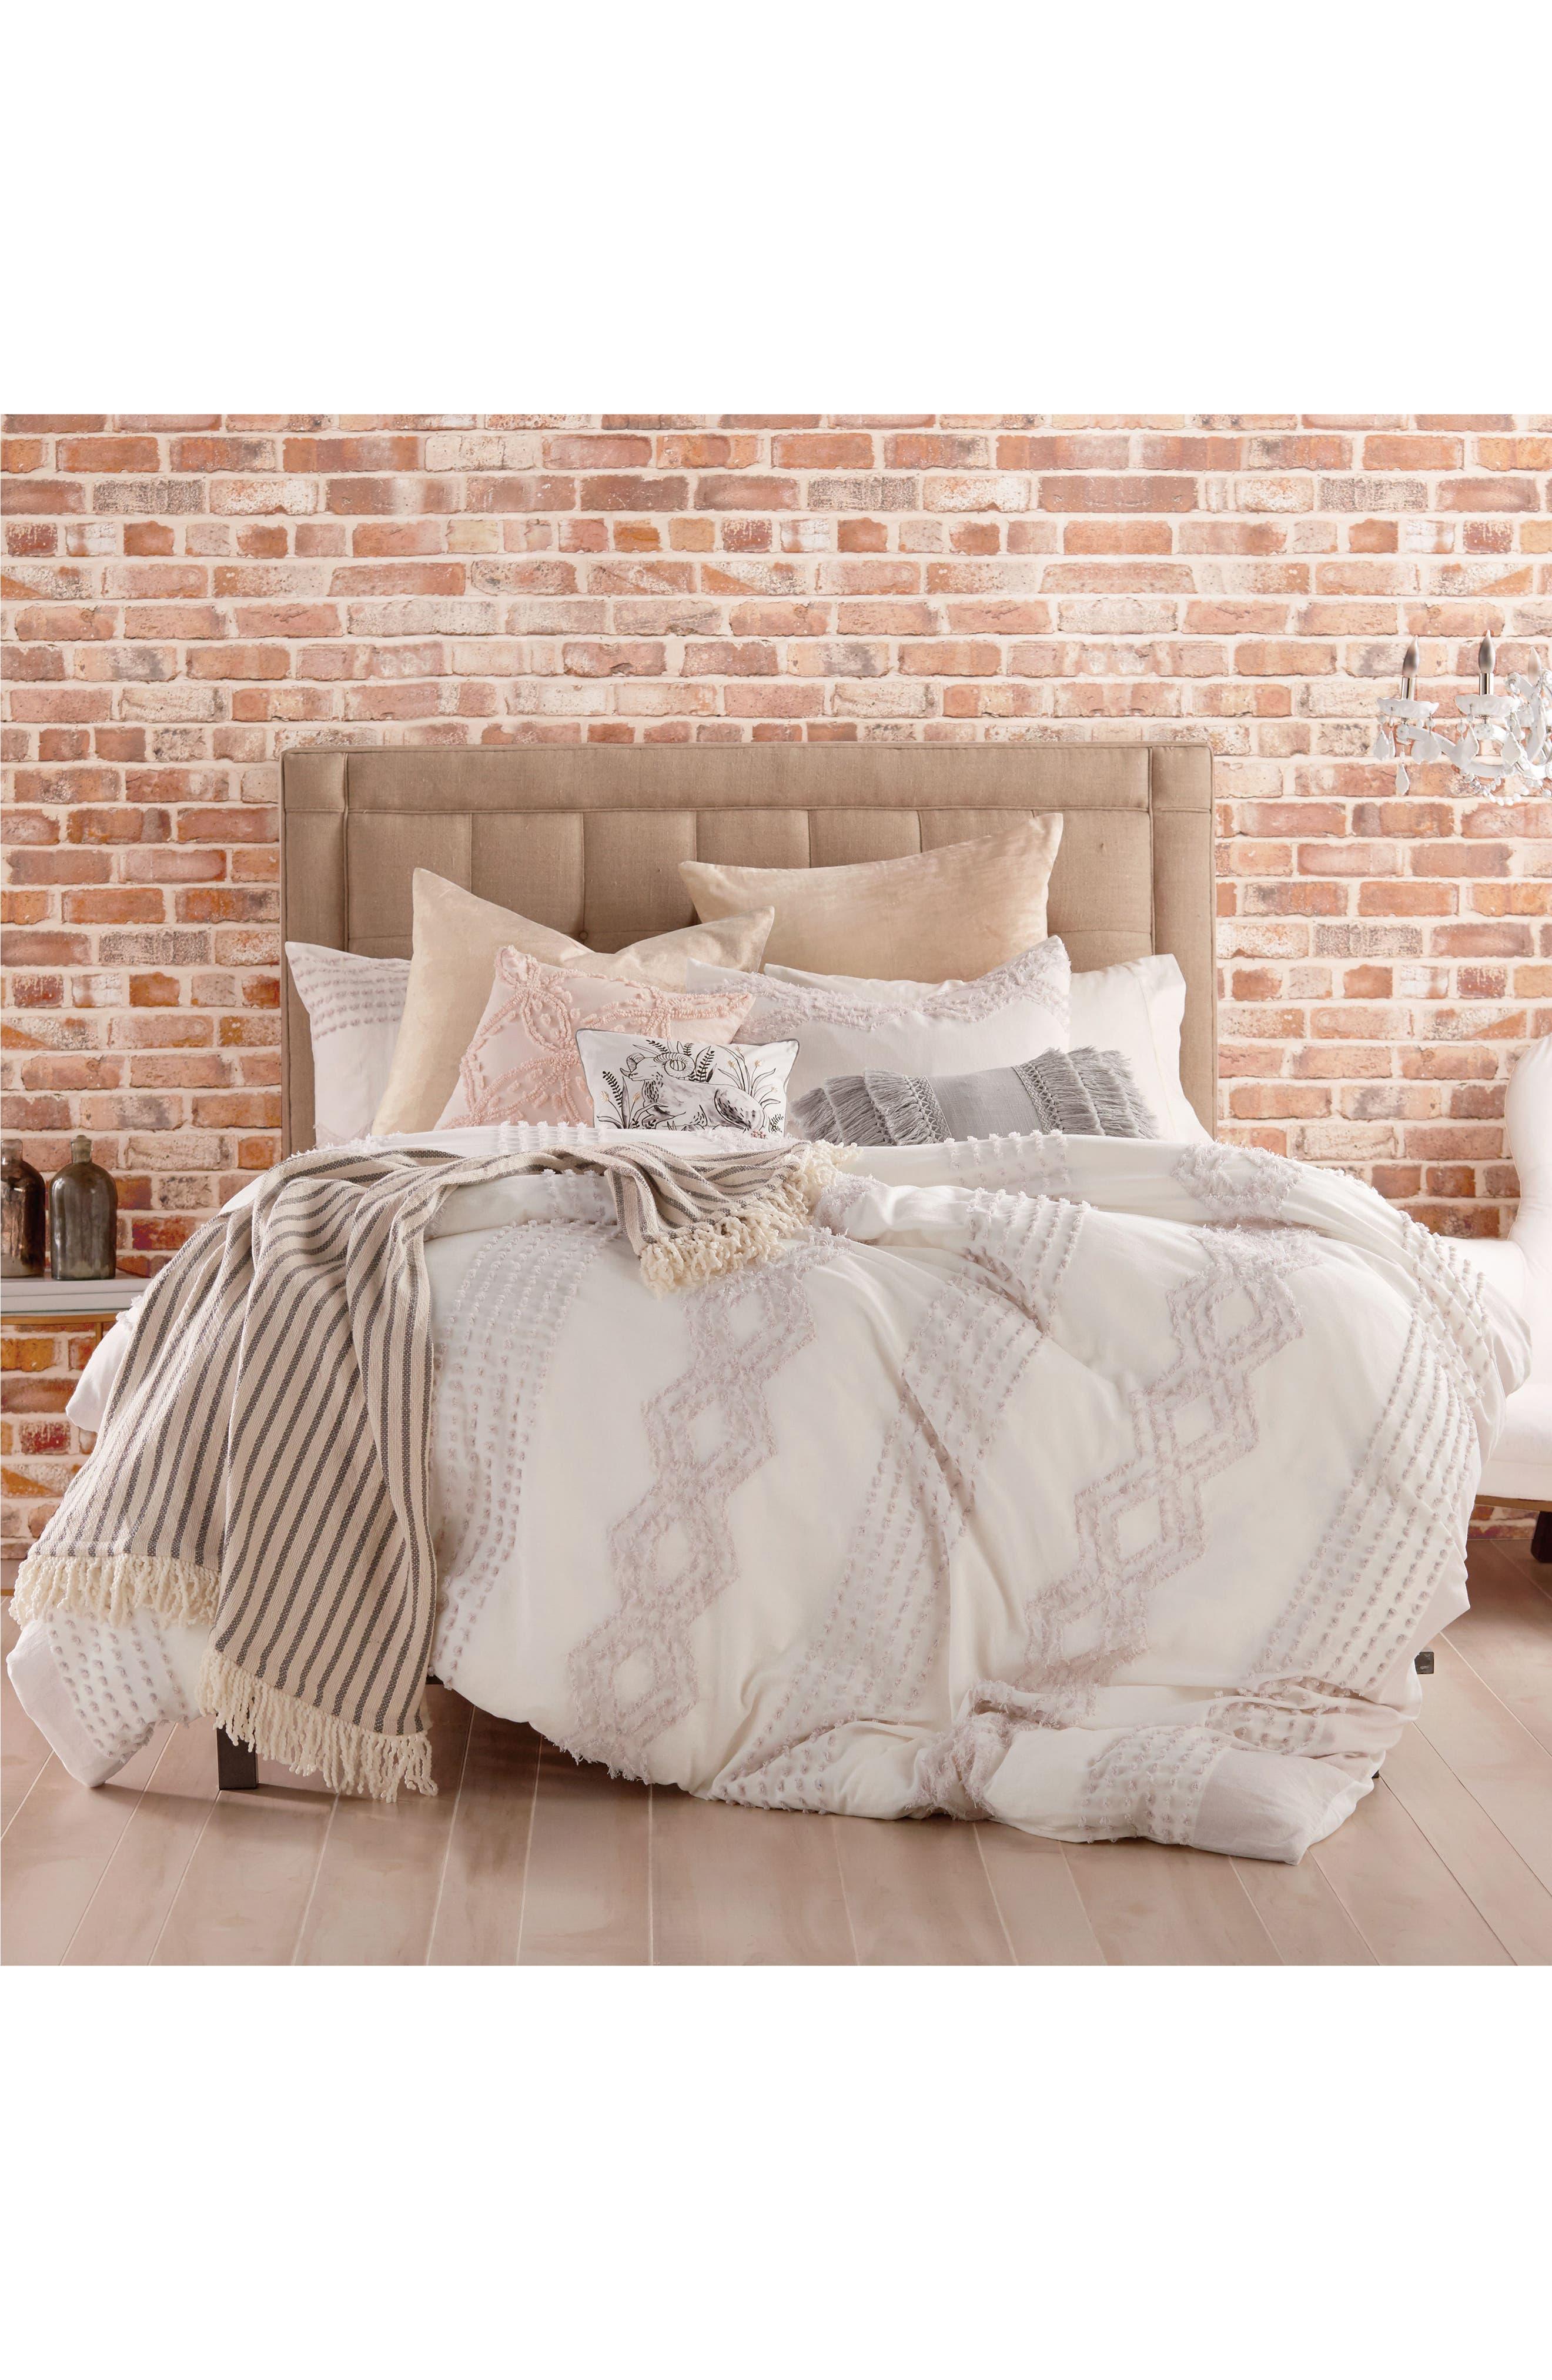 Main Image - Peri Home Cut Geo Chenille Comforter & Sham Set